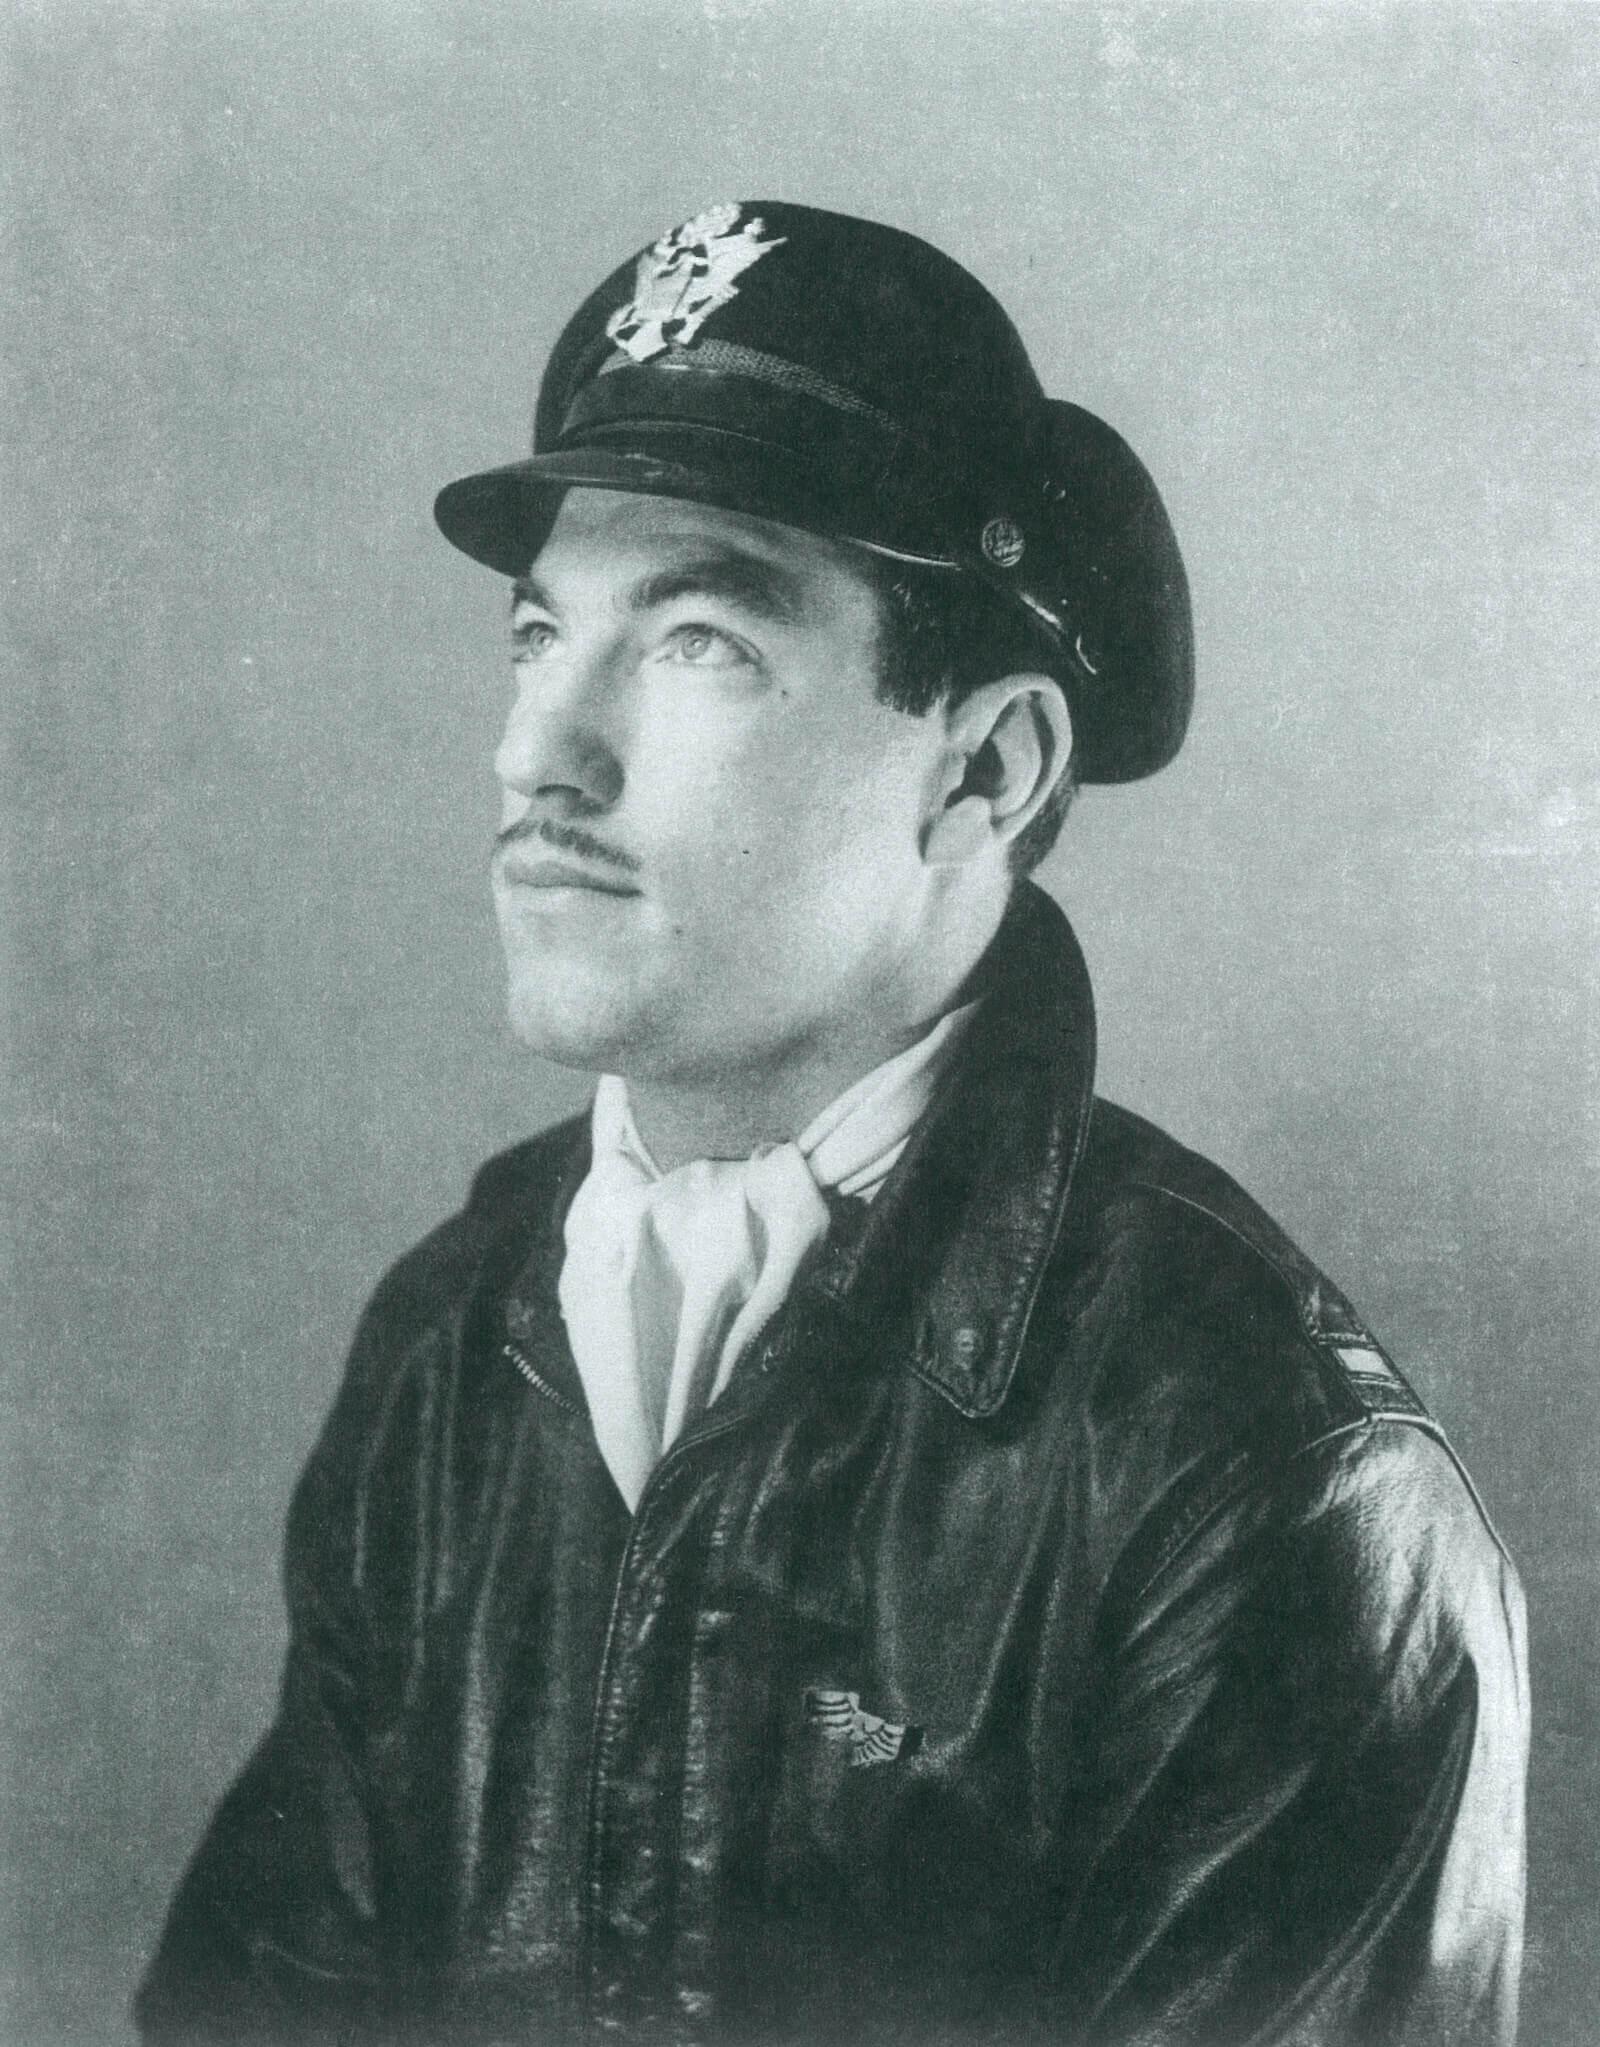 Chuck Baker in uniform